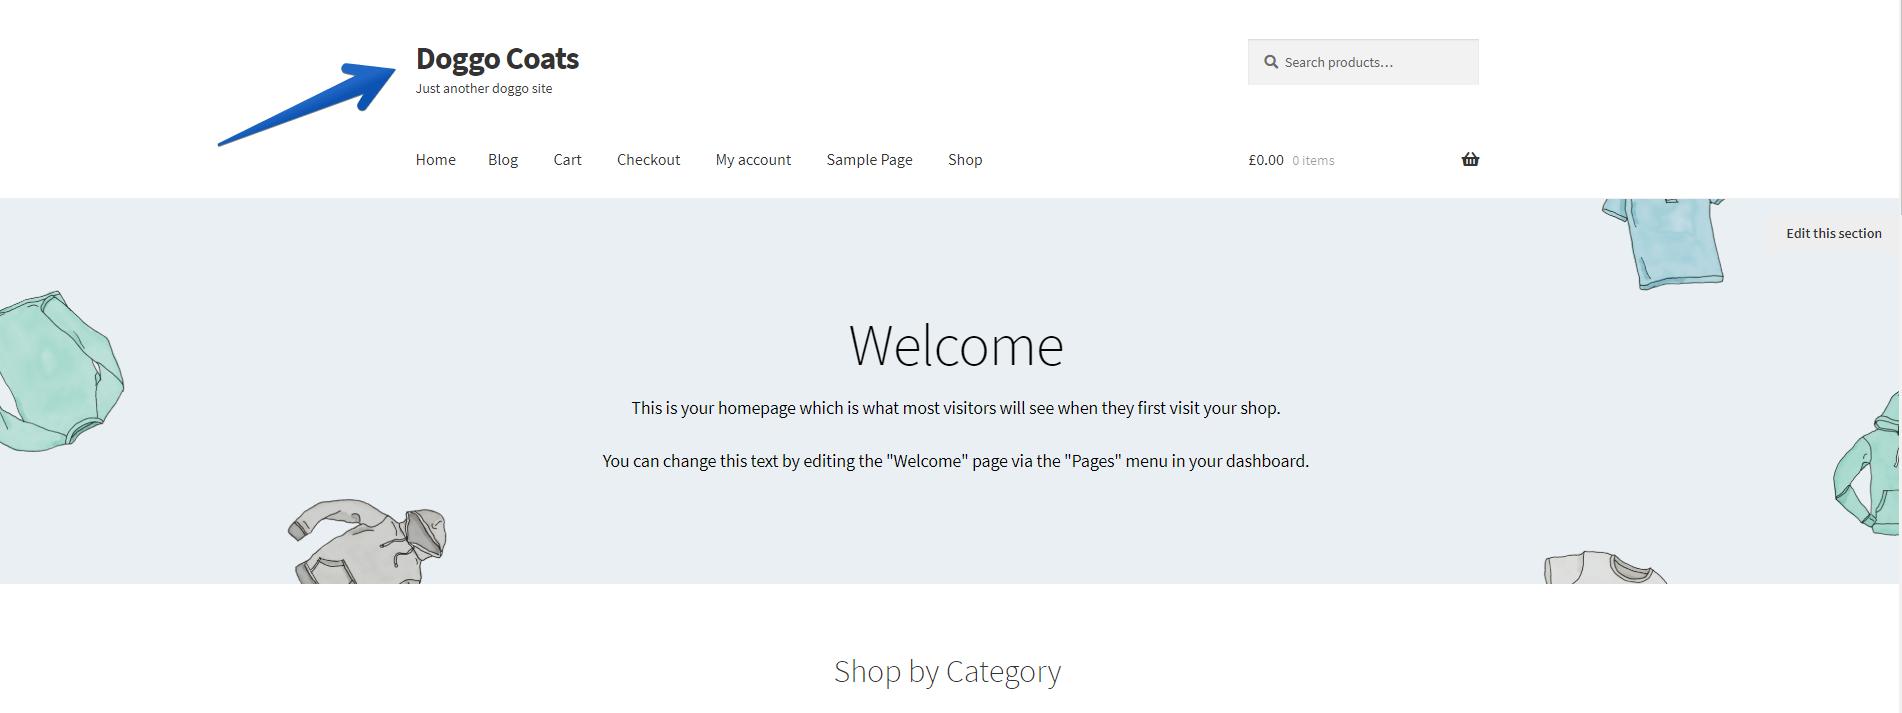 Storefront Shop Title and Tagline